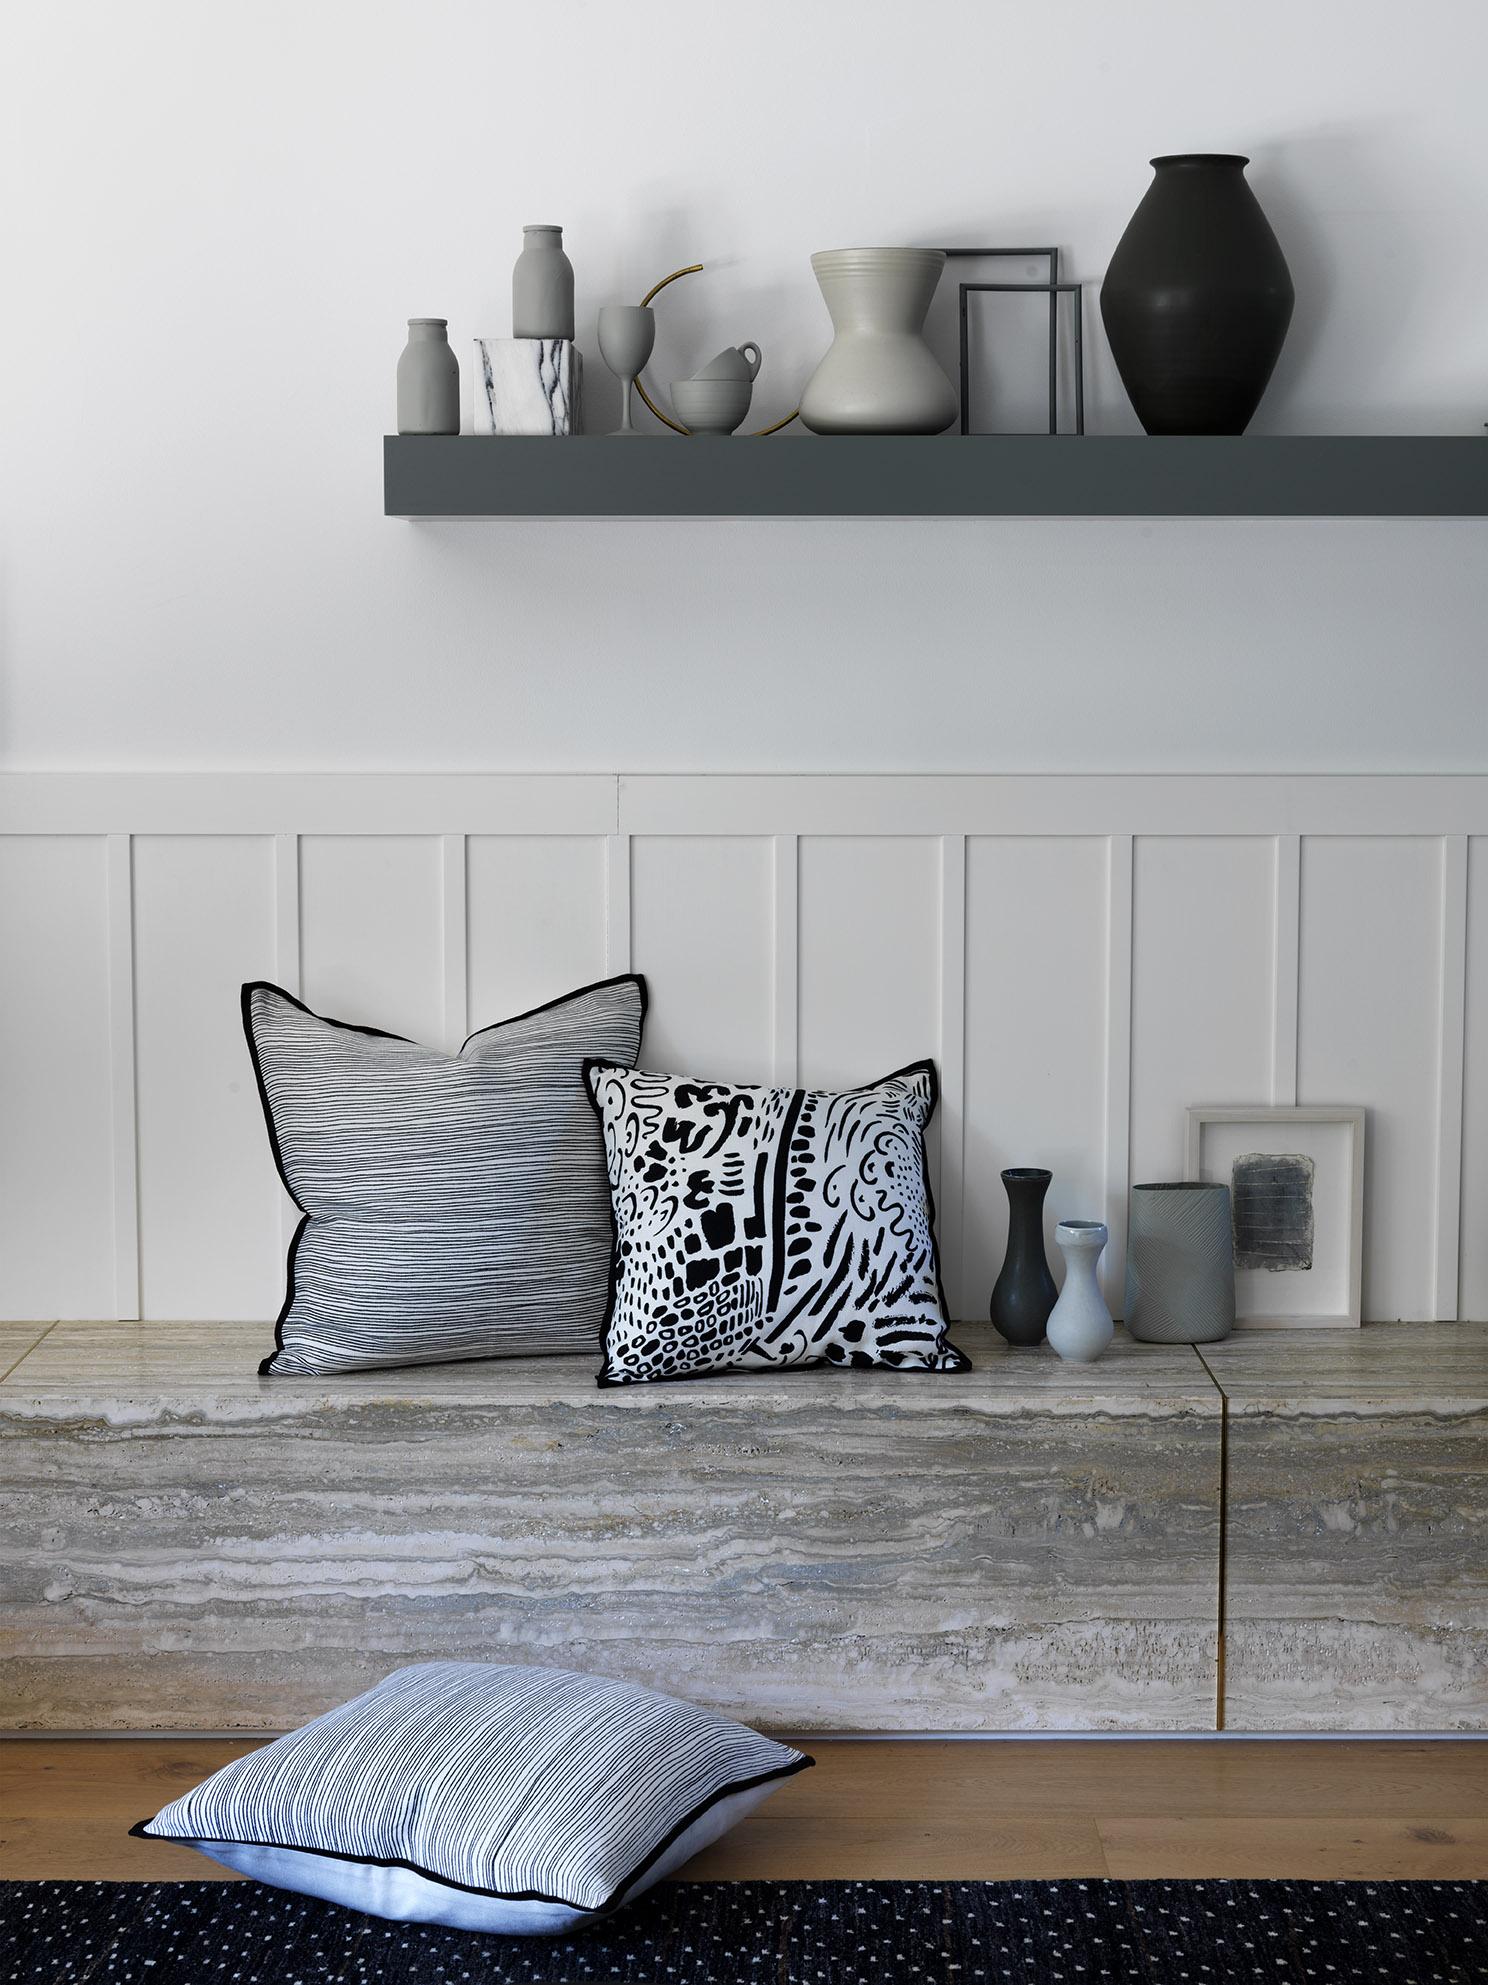 kk-campaign-cushions-black-3.jpg